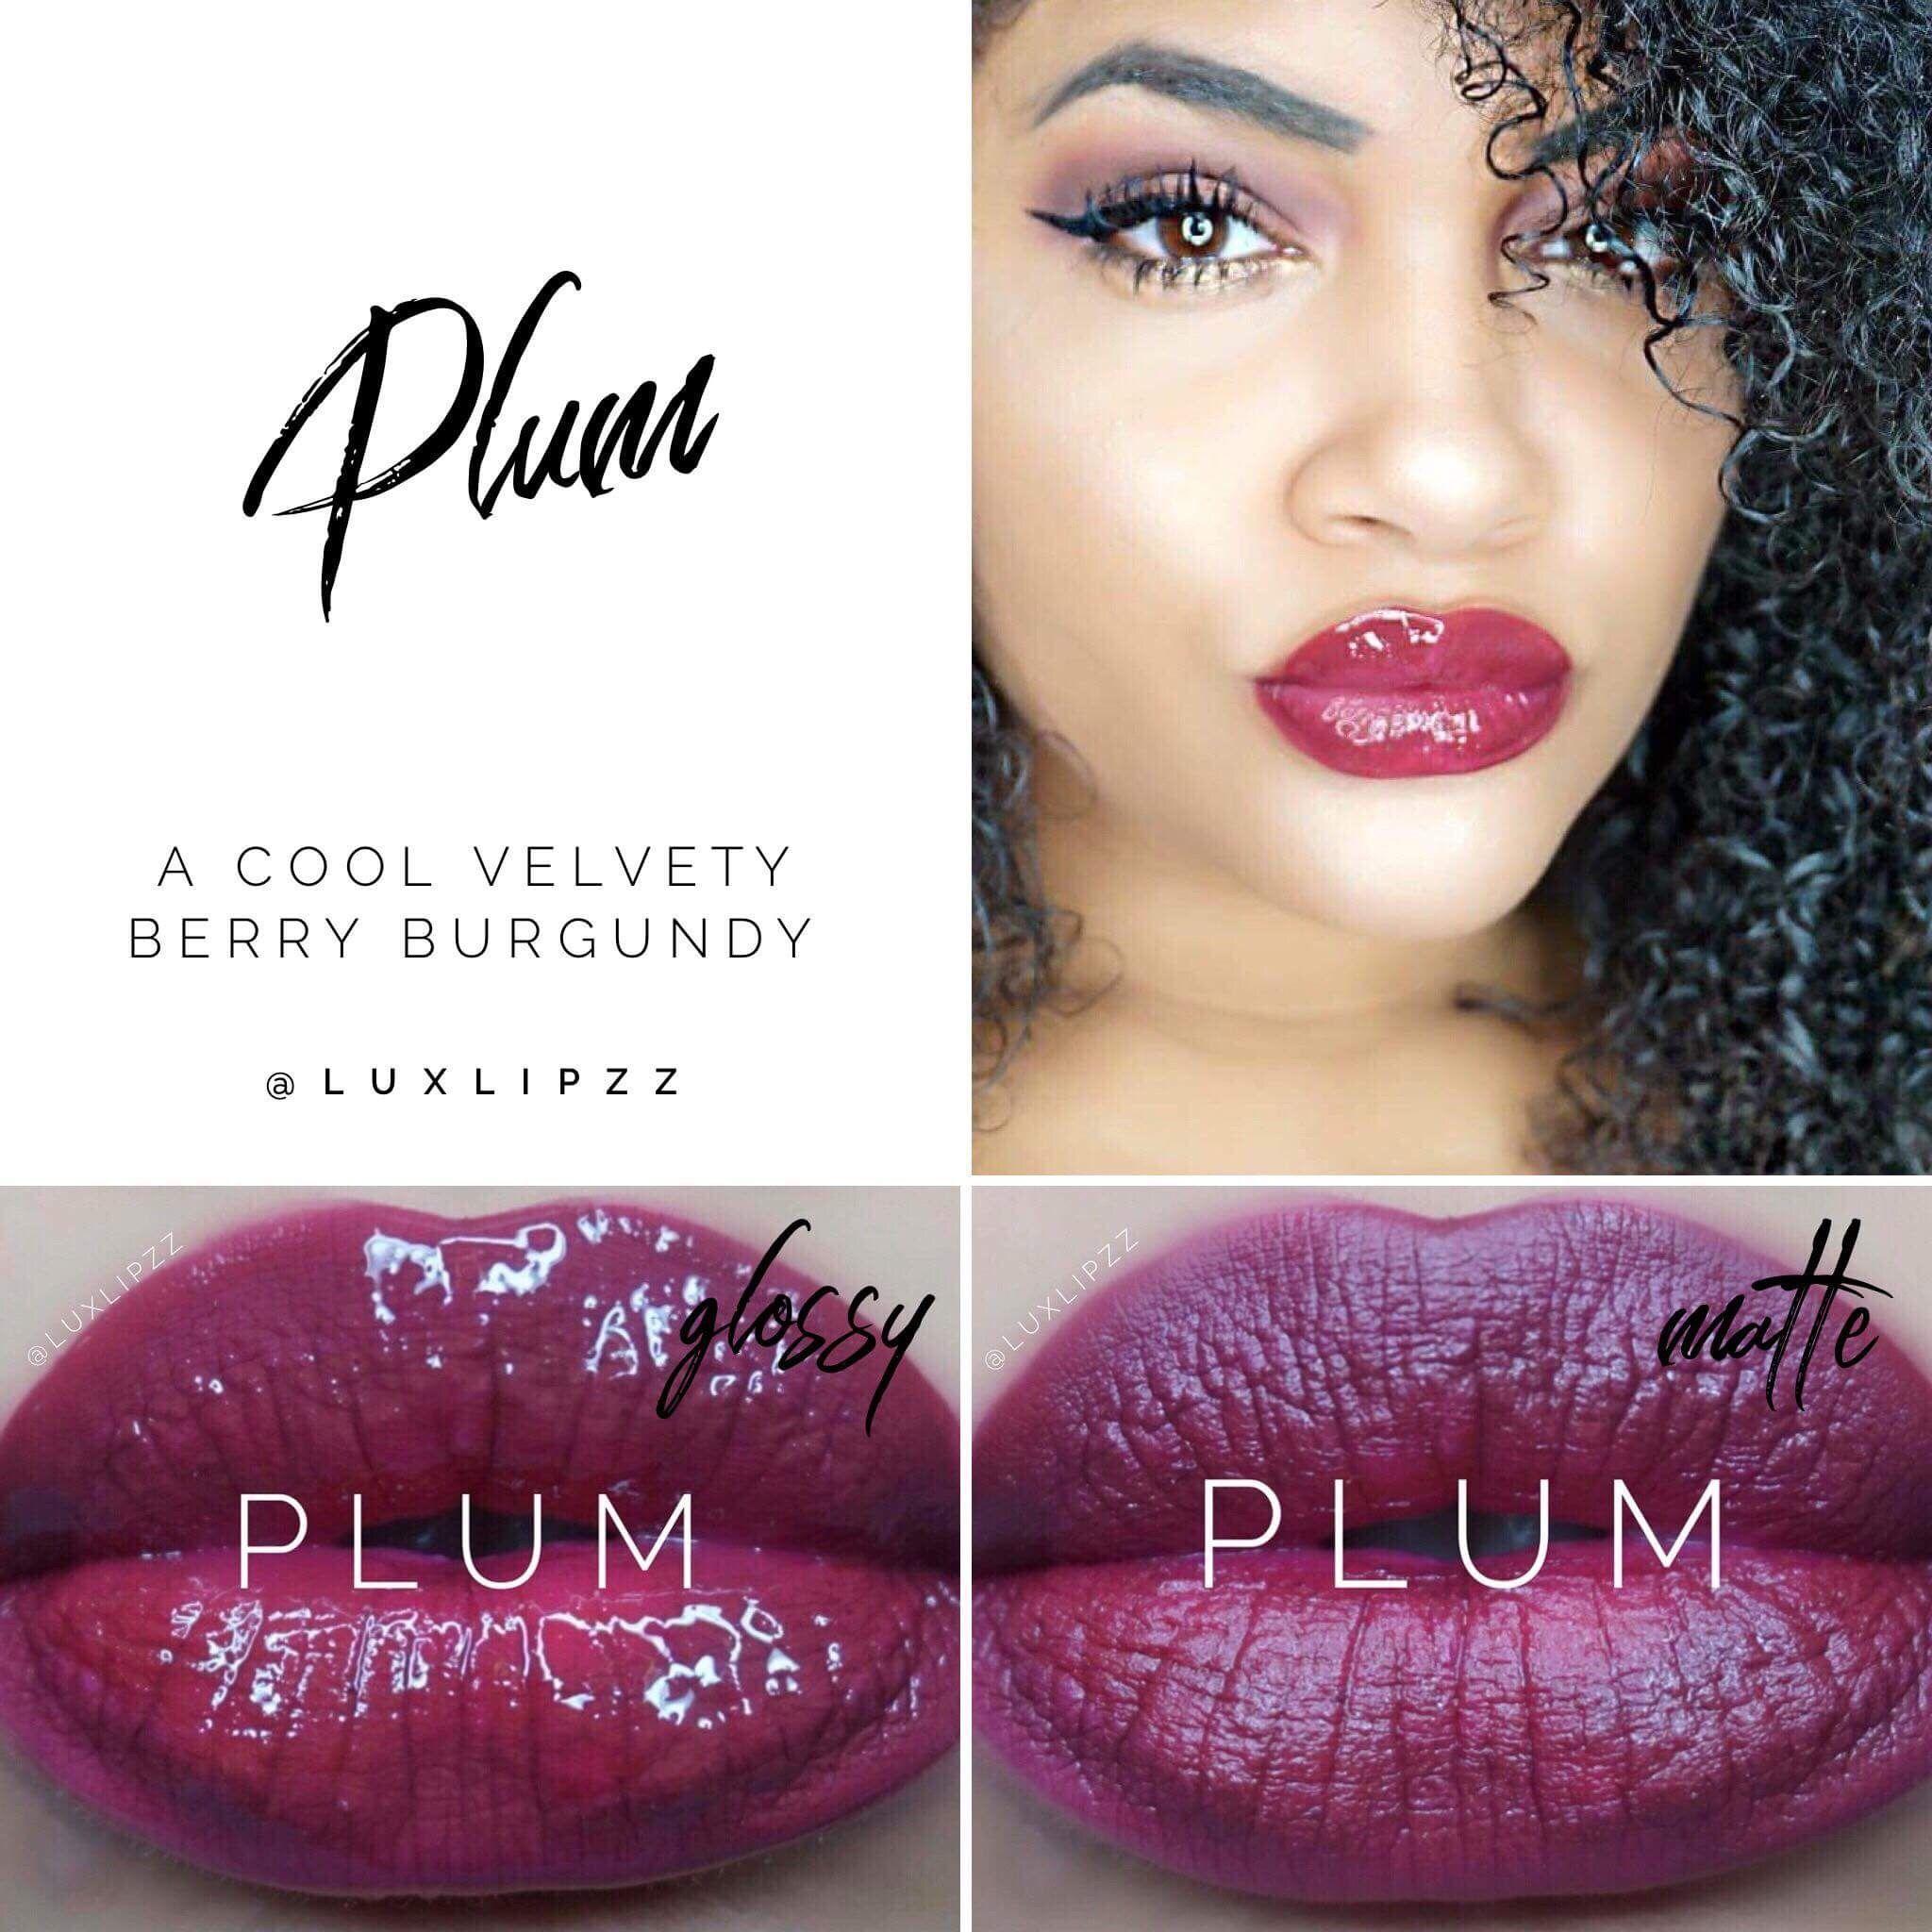 Plum Lipsense It Is Vegan Gluten Free Lipstick That Won T Come Off